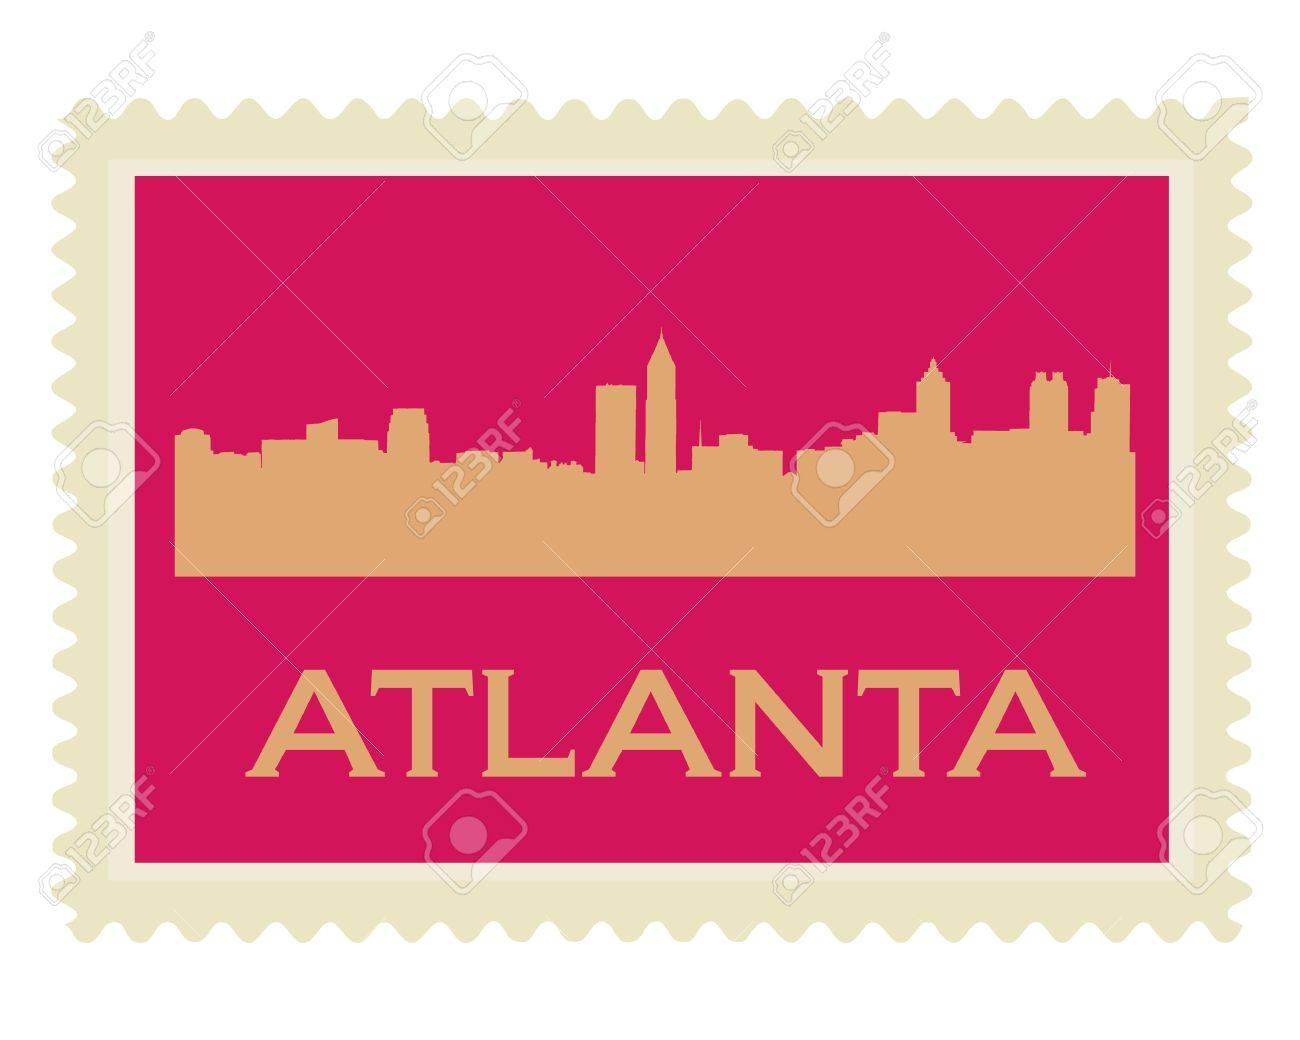 Atlanta high-rise buildings skyline stamp Stock Vector - 12486336